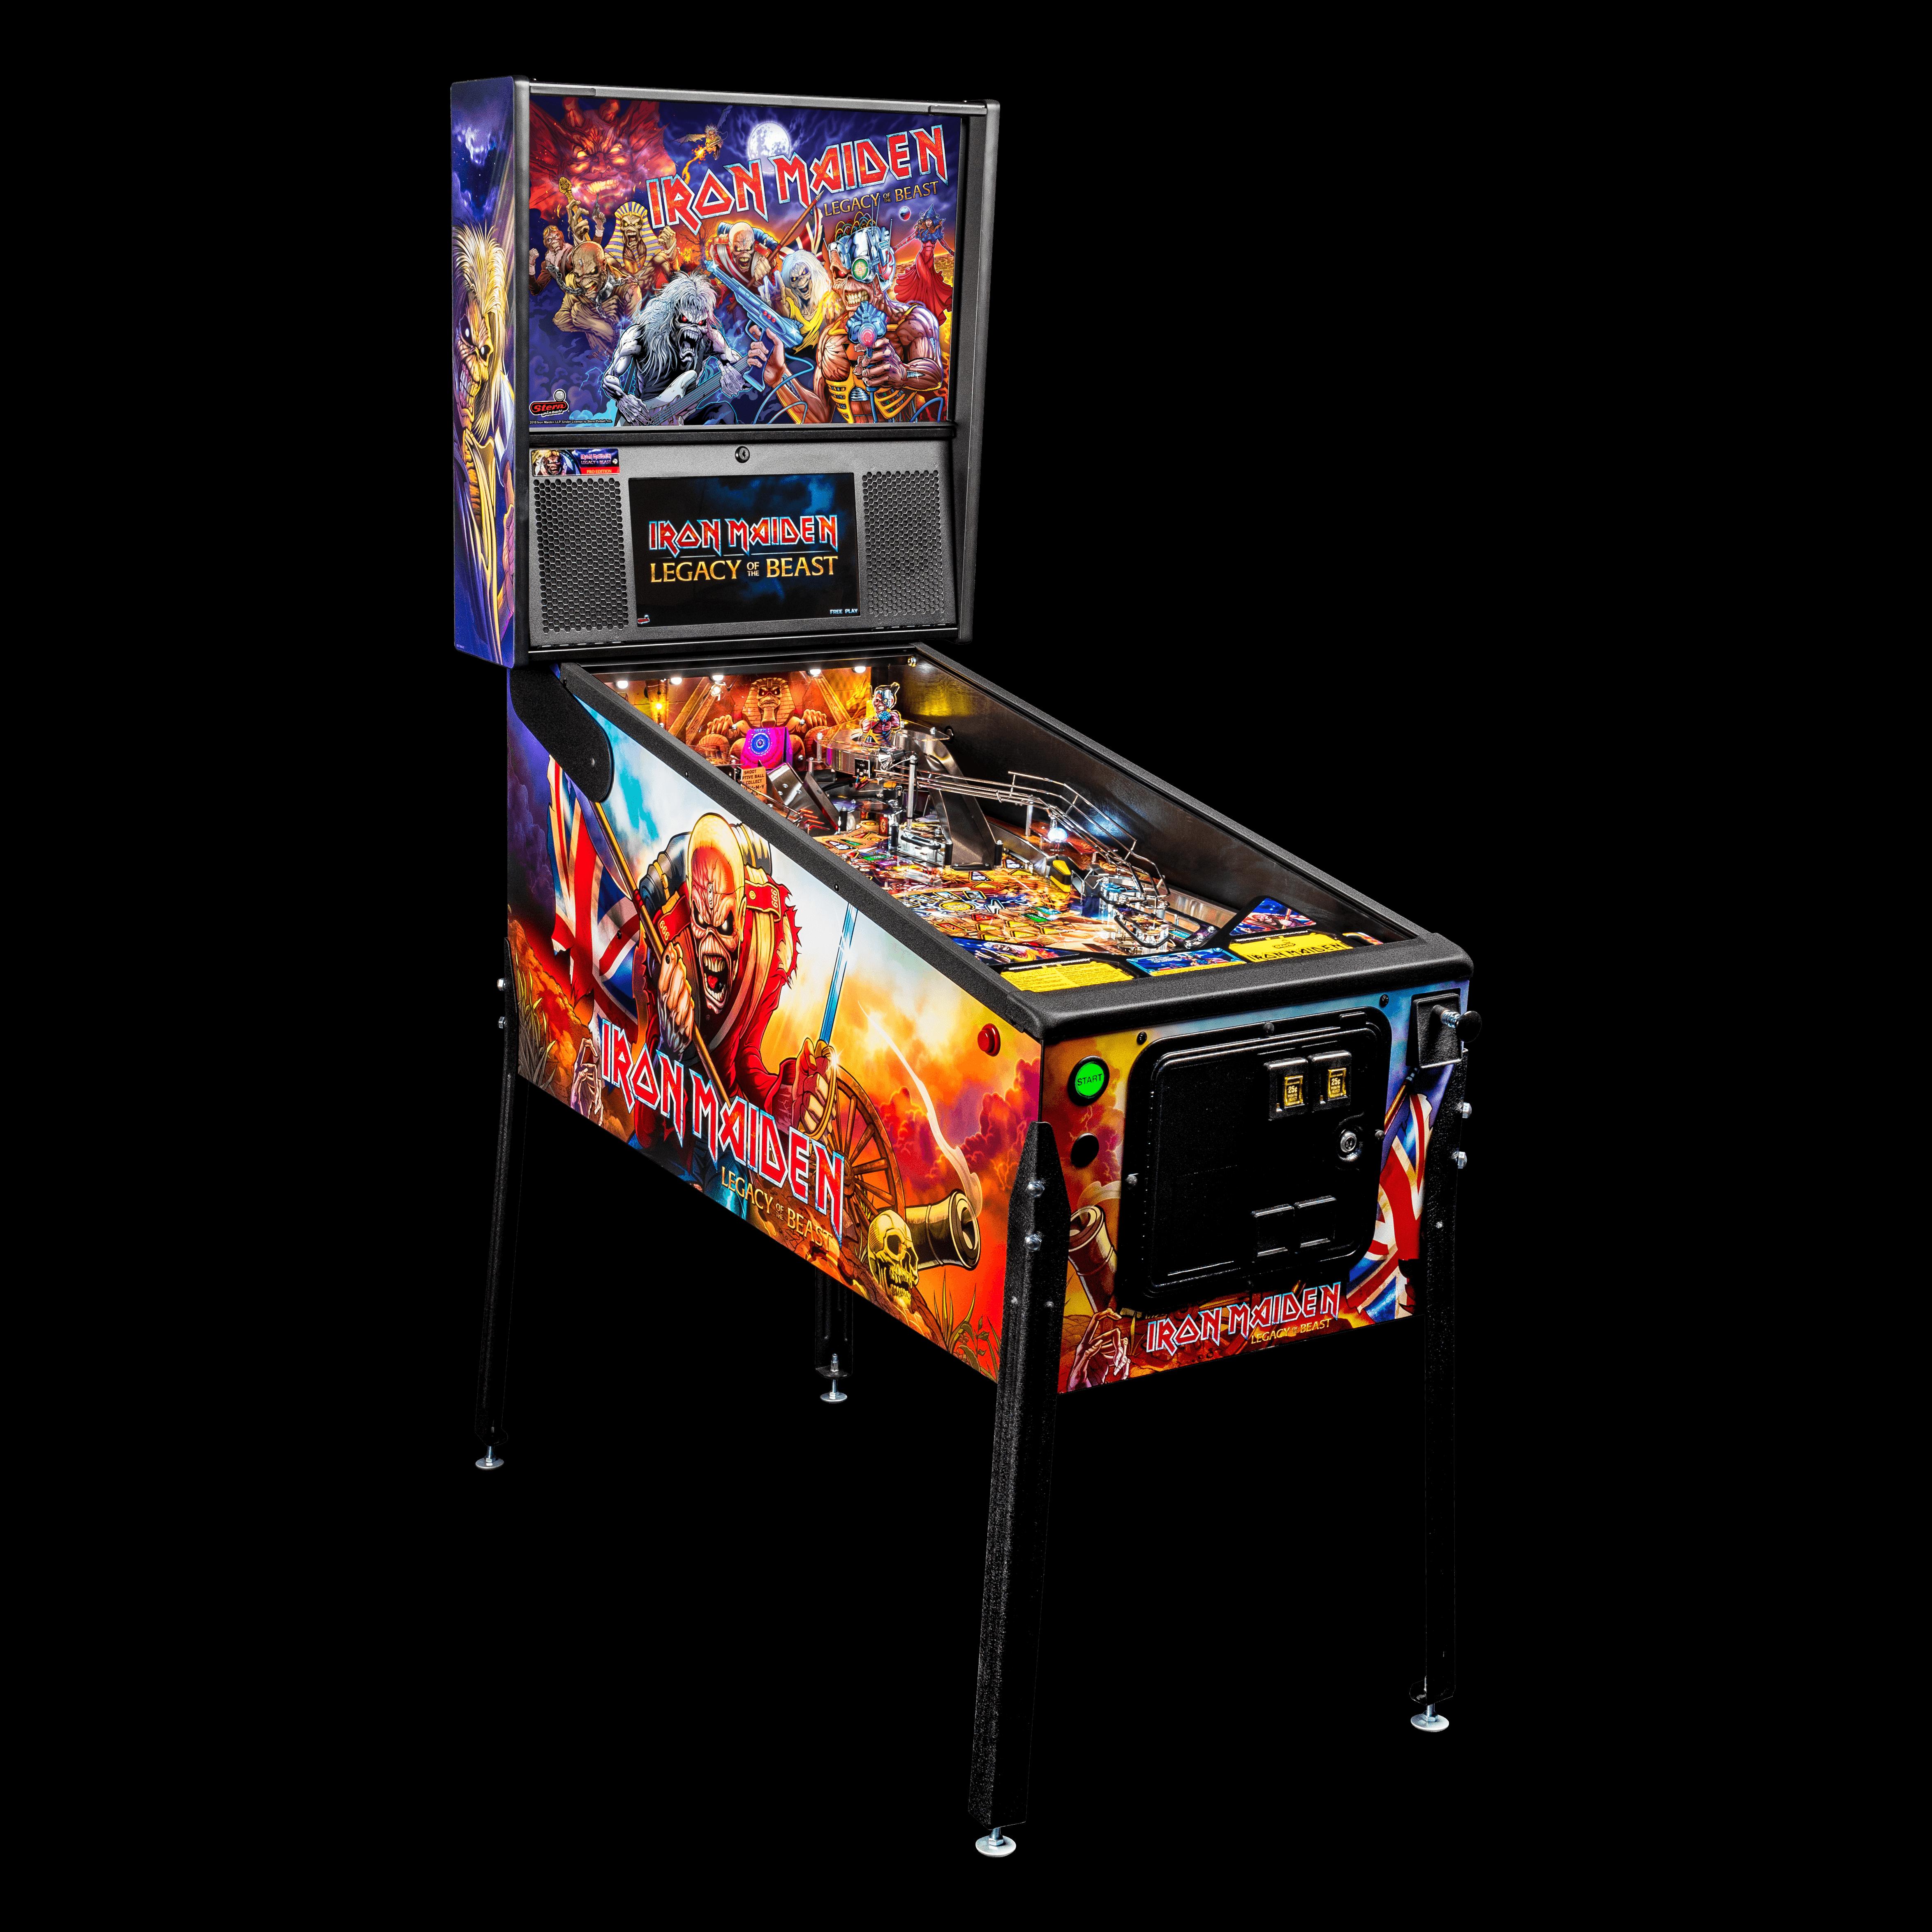 Iron Maiden Pro Pinball Machine by Stern.